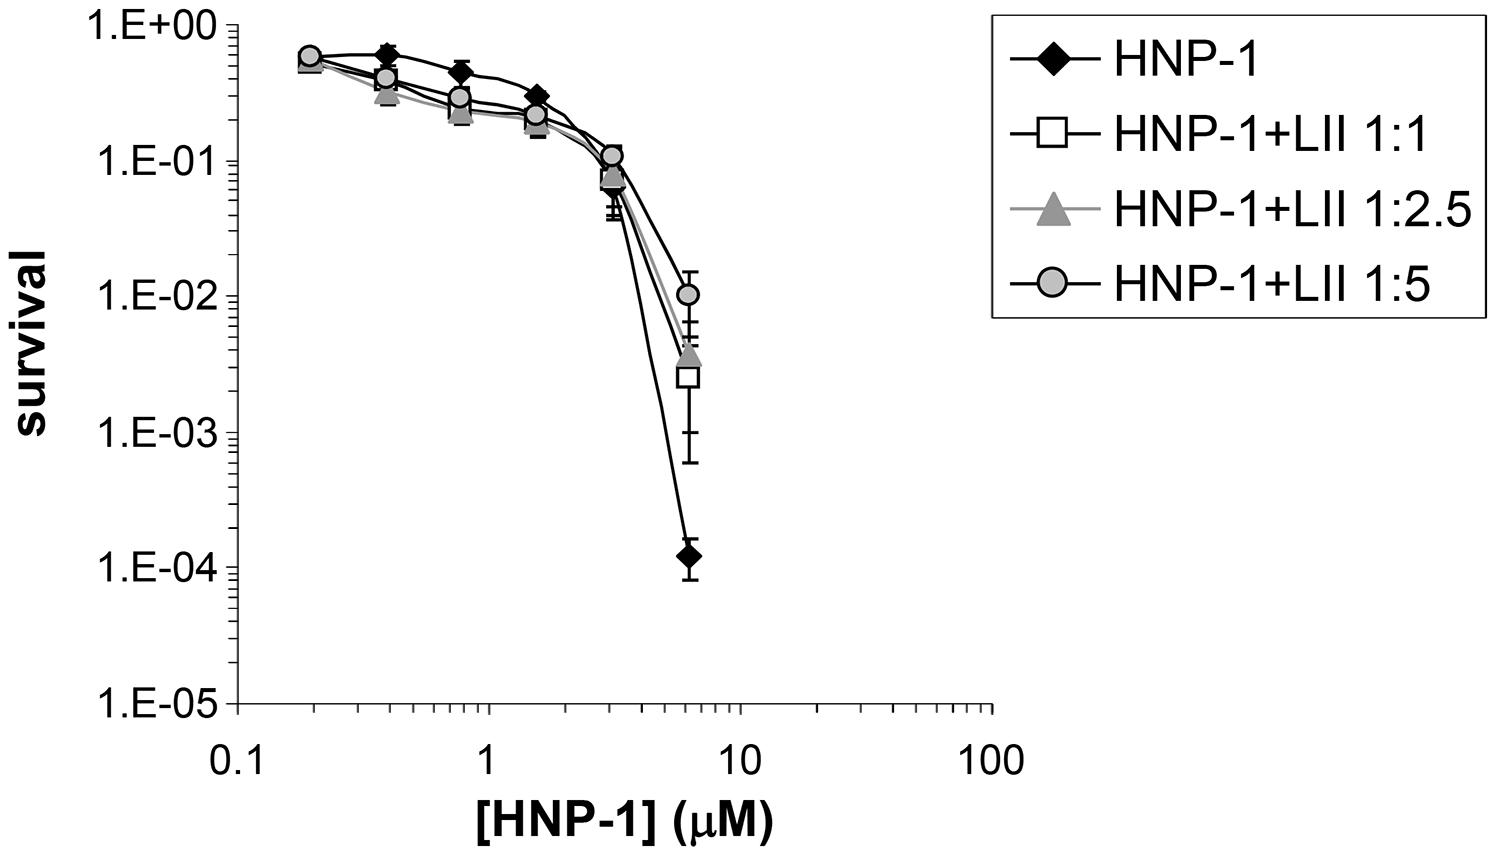 Lipid II antagonizes the antibacterial activity of HNP-1.